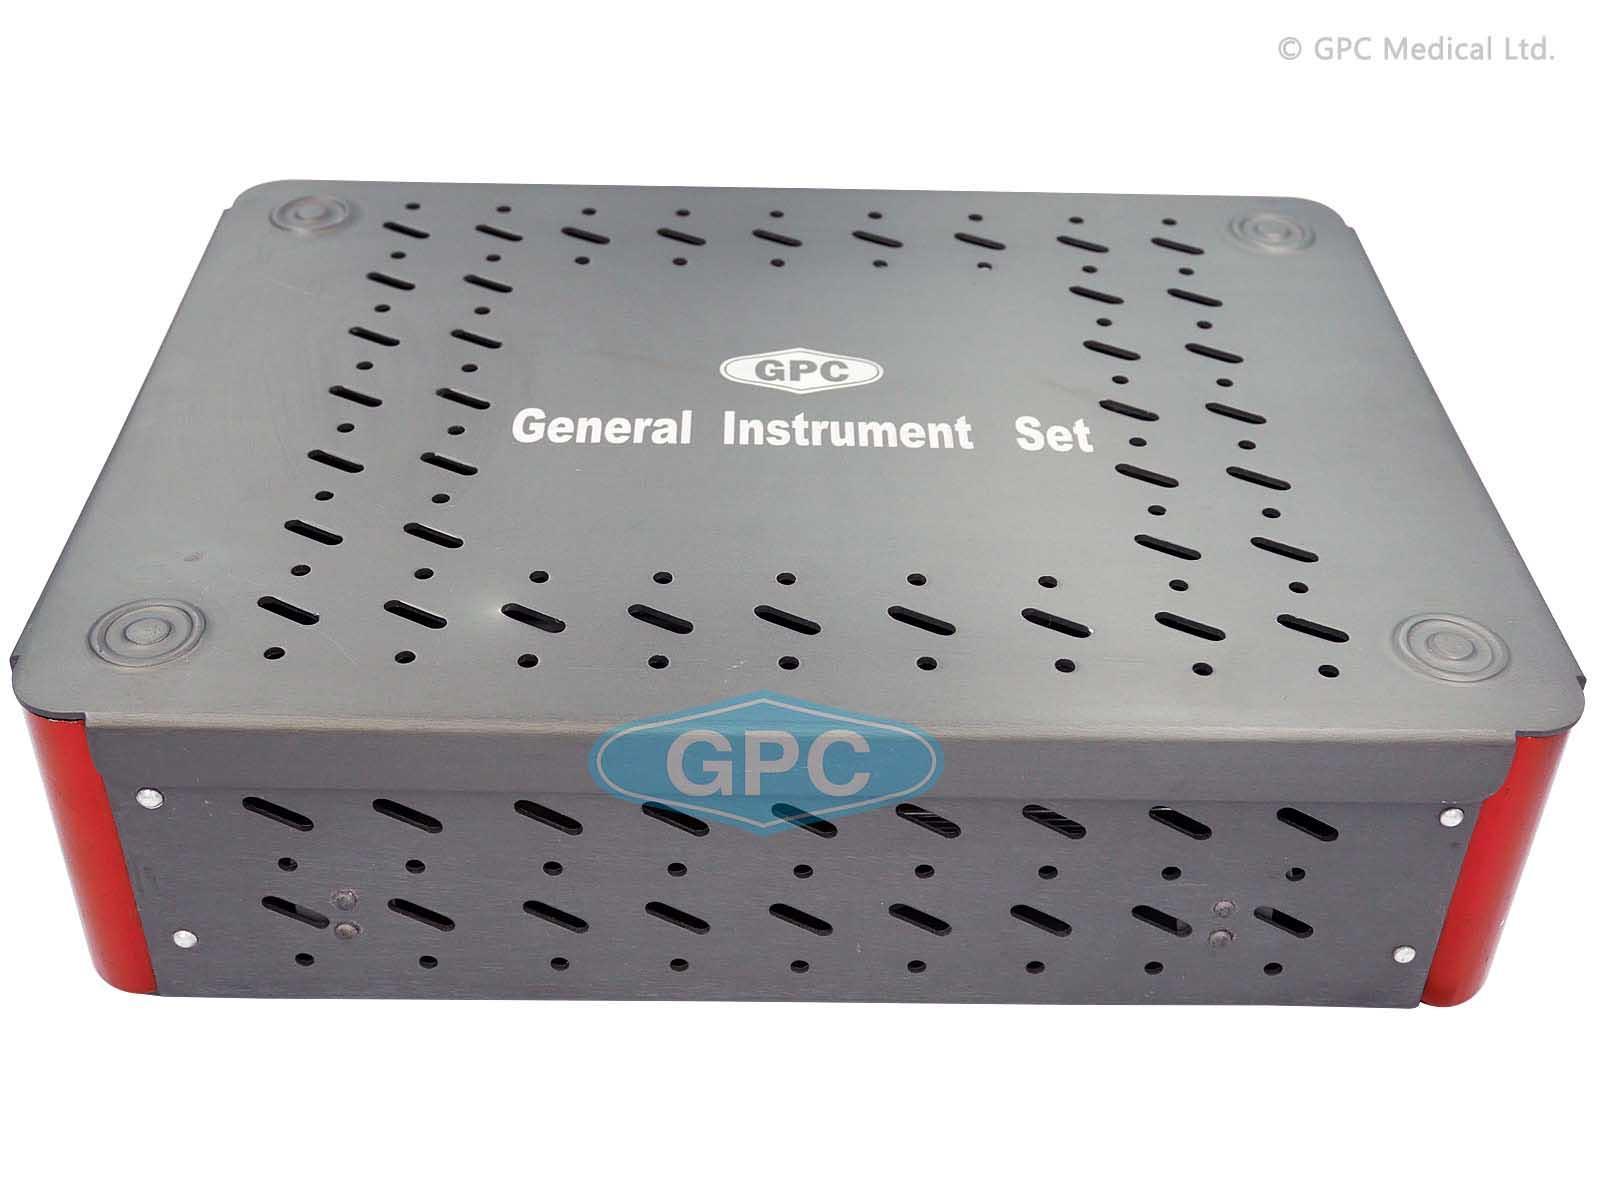 General Instrument Set